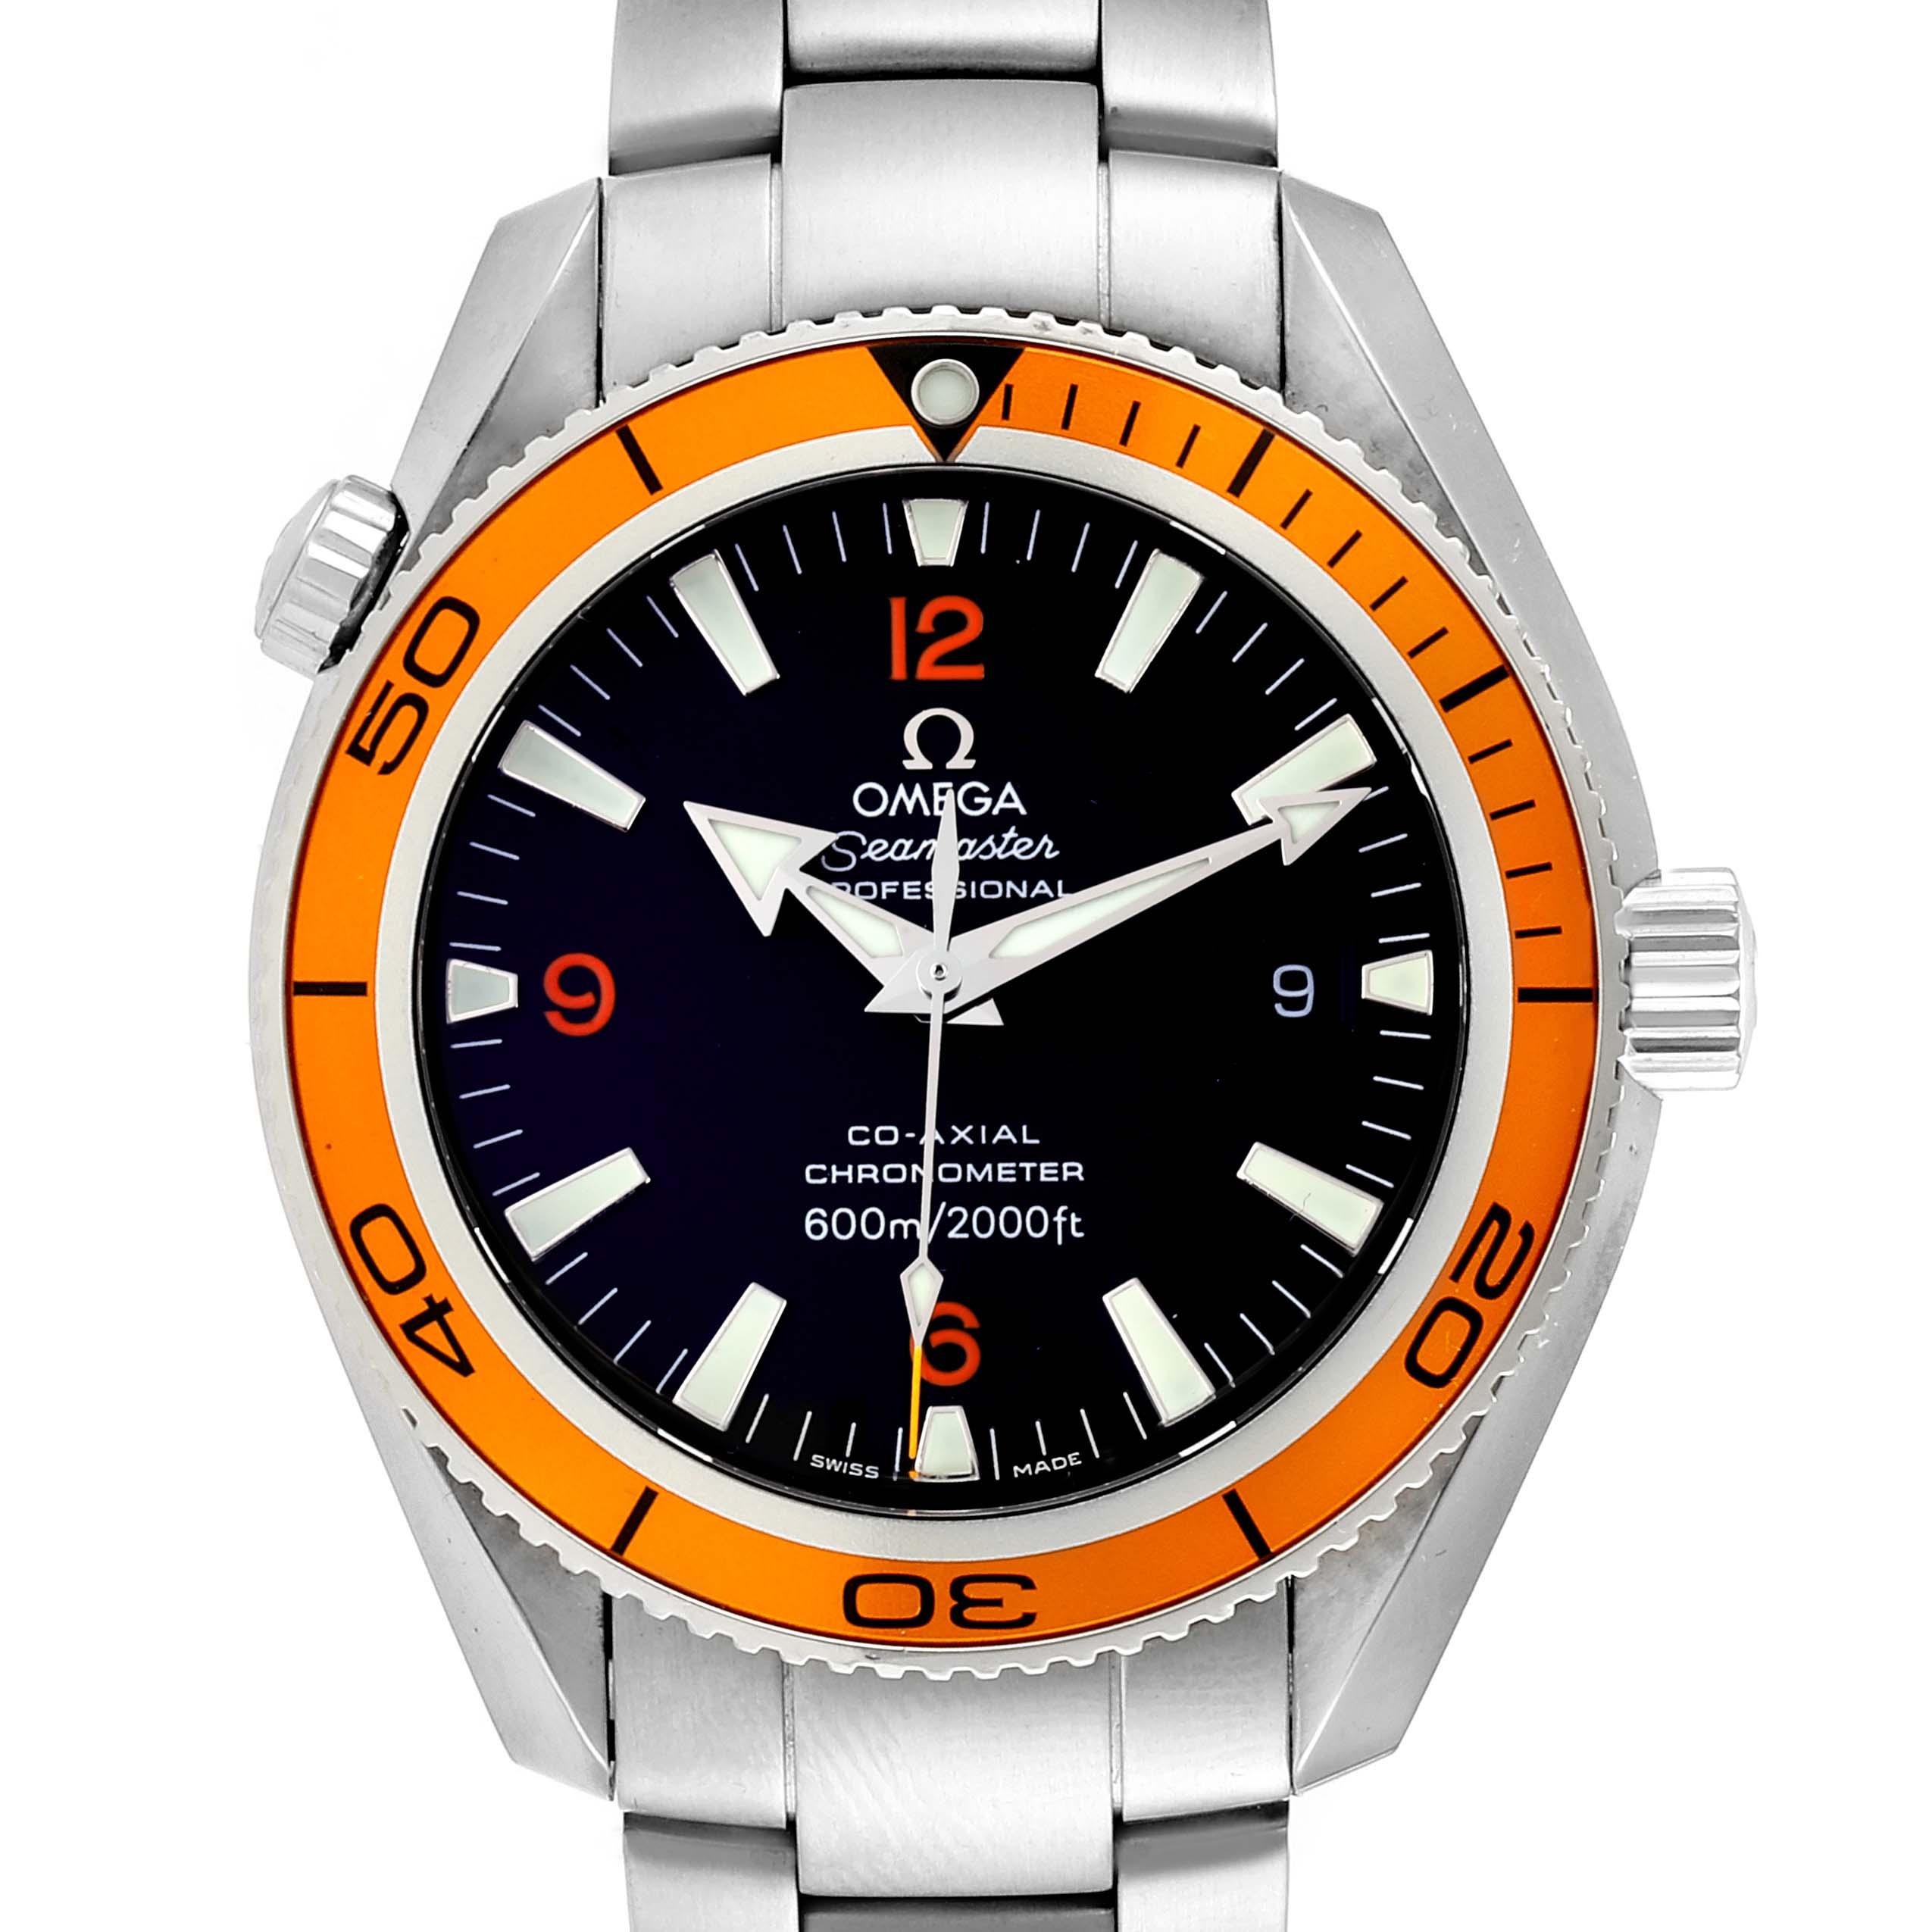 Omega Seamaster Planet Ocean Orange Bezel Watch 2209.50.00 Card